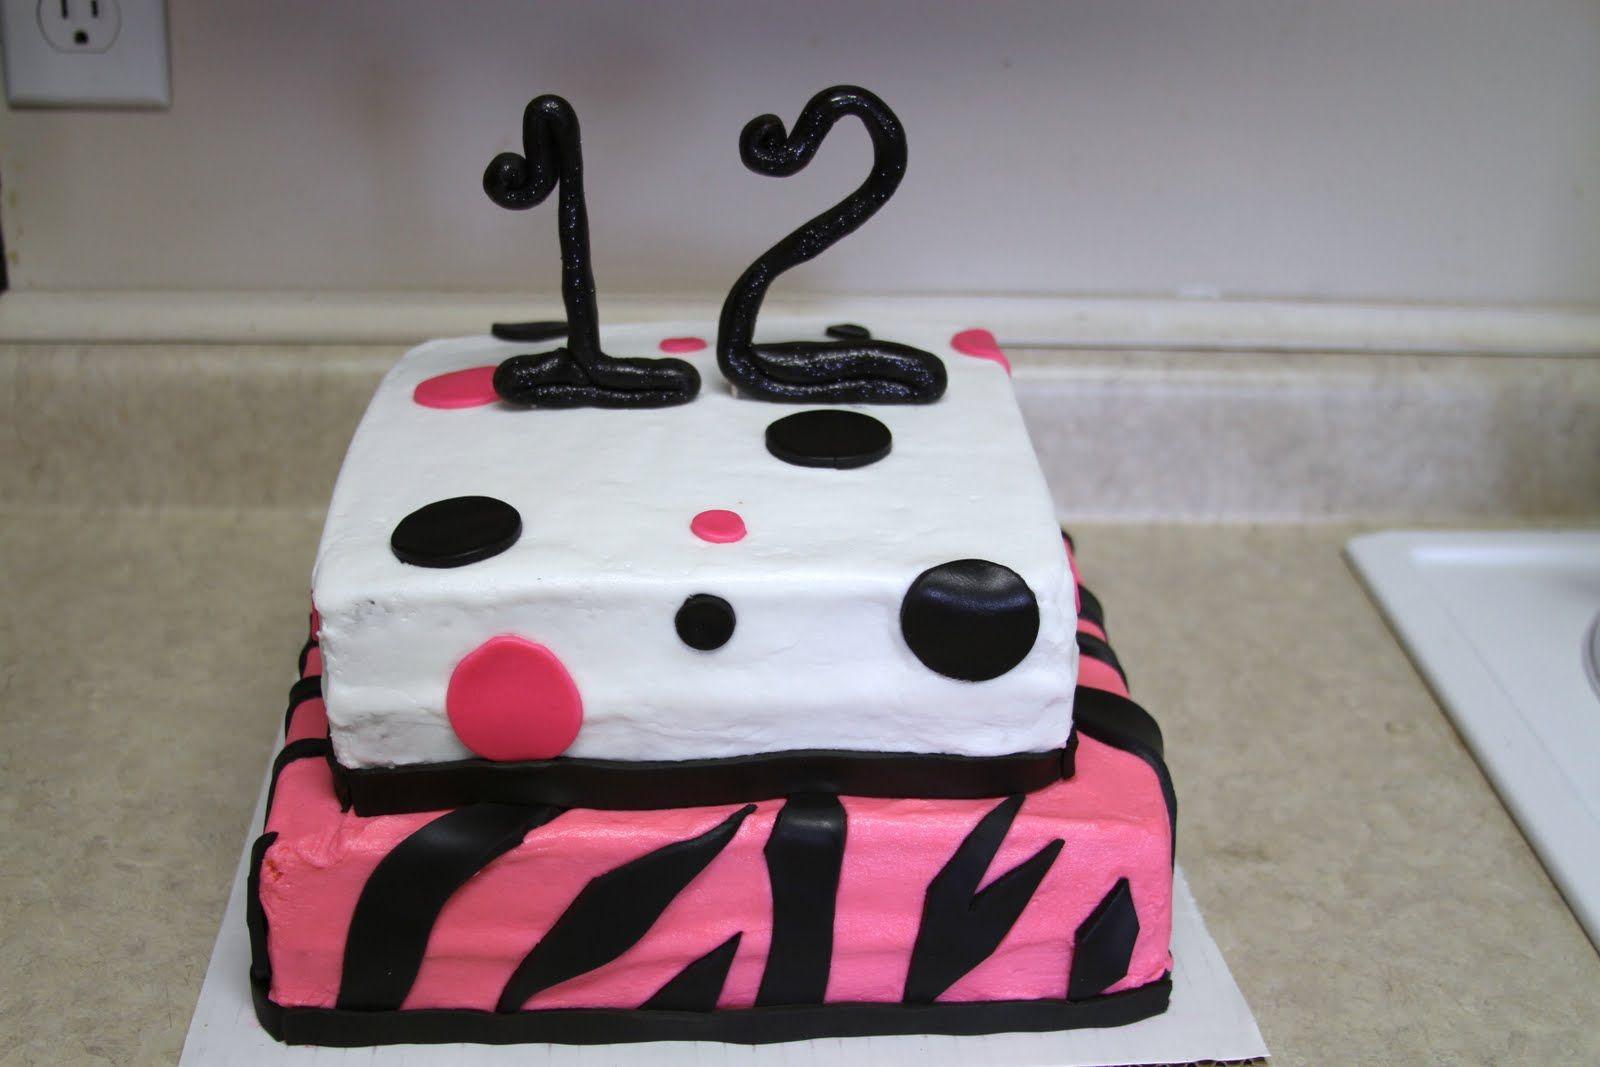 Astounding Zebra Poka Dot 12Th Birthday Cake 12Th Birthday Cake Cake Funny Birthday Cards Online Elaedamsfinfo